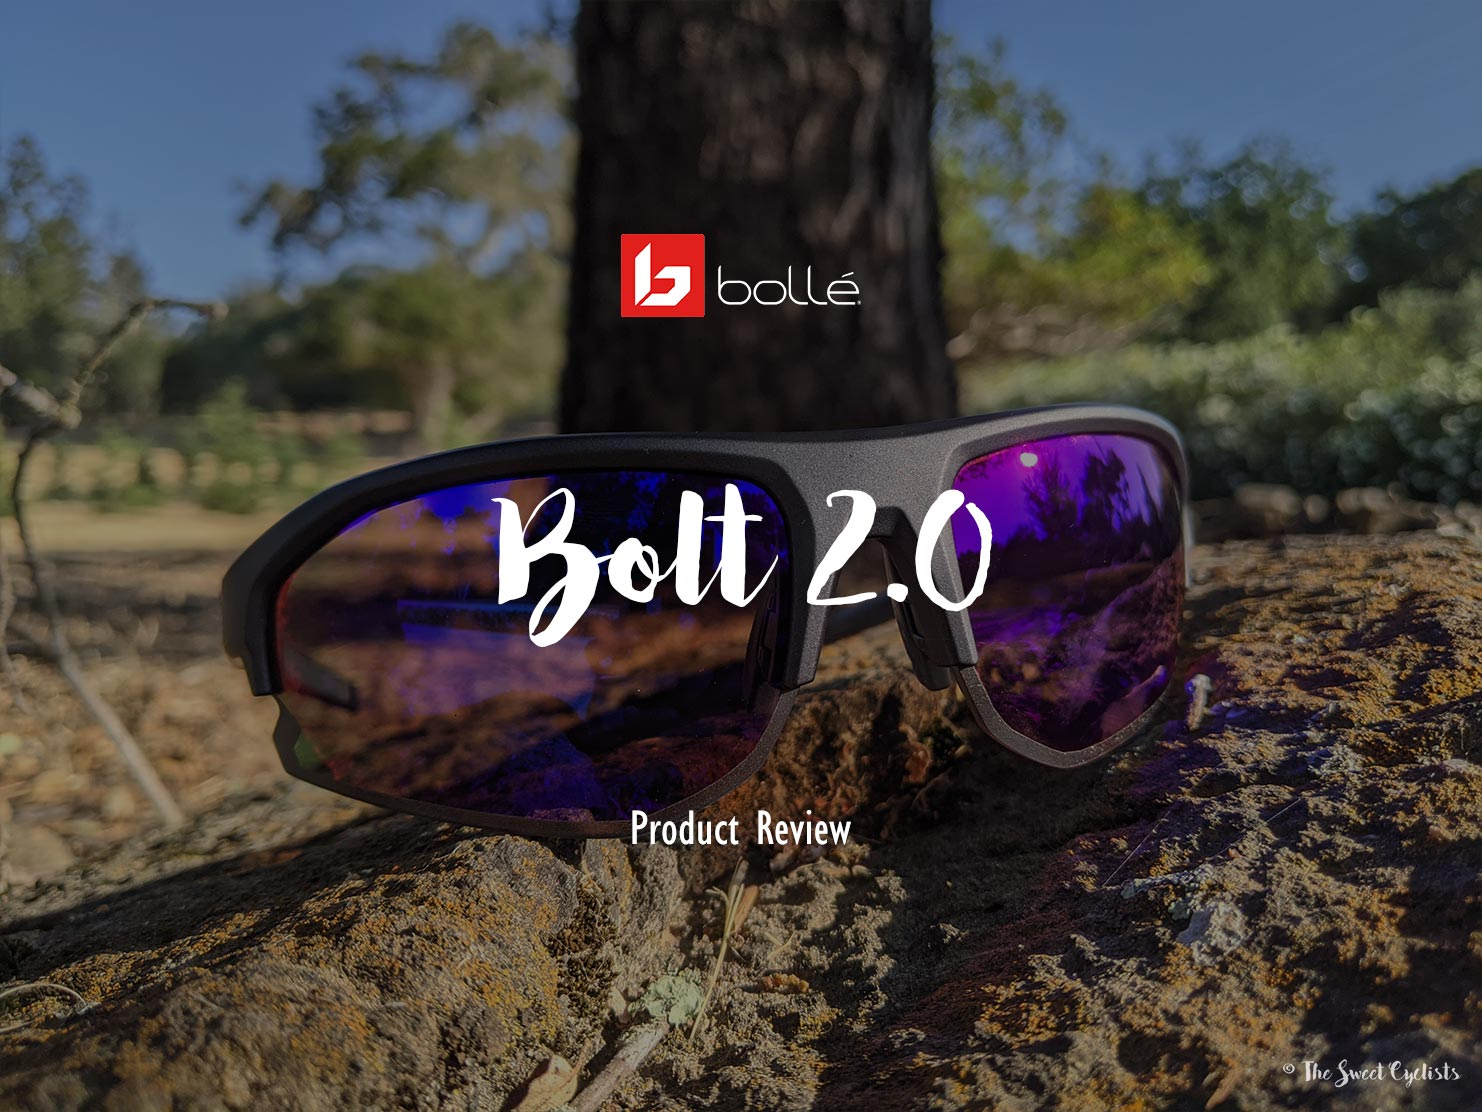 Bollé refreshes the classic Bolt sunglasses